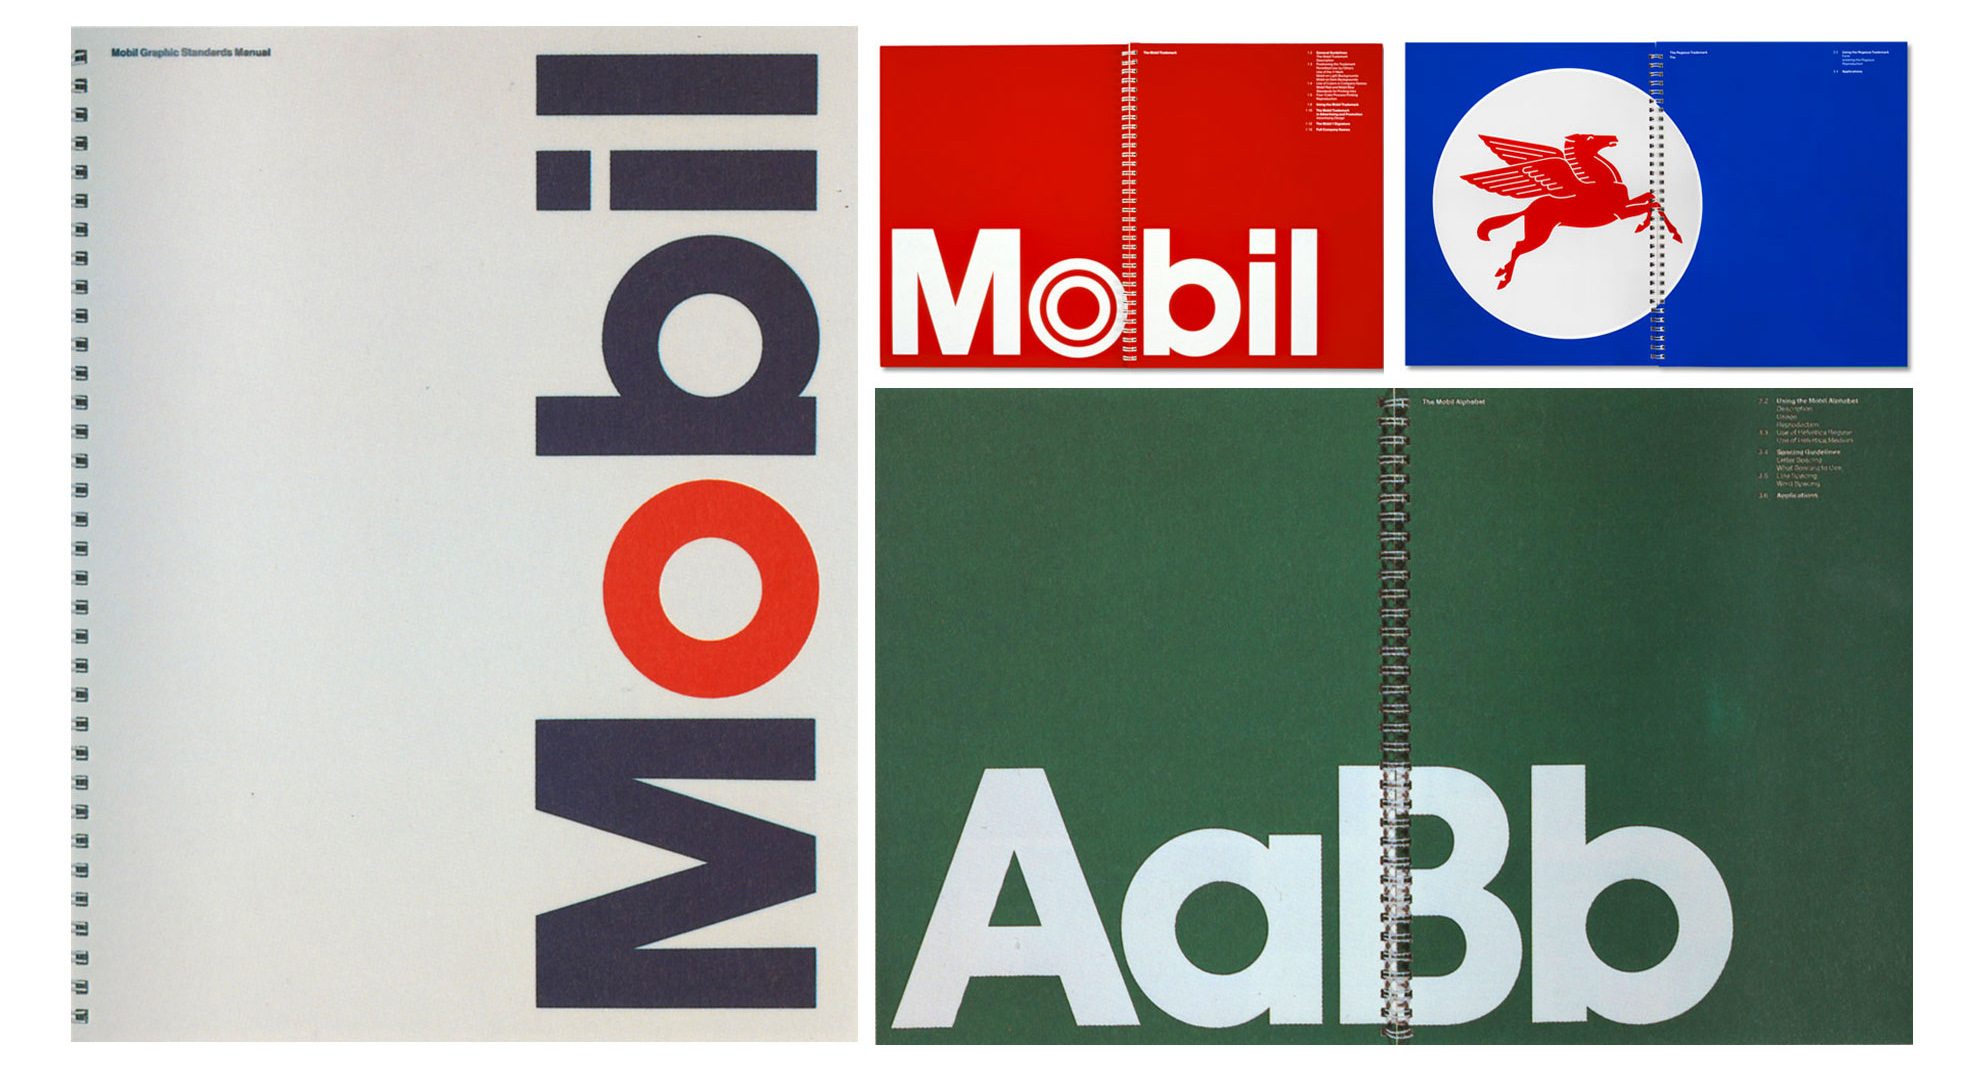 Chermayeff-and-Geismar-mobil-oil-identite-1964